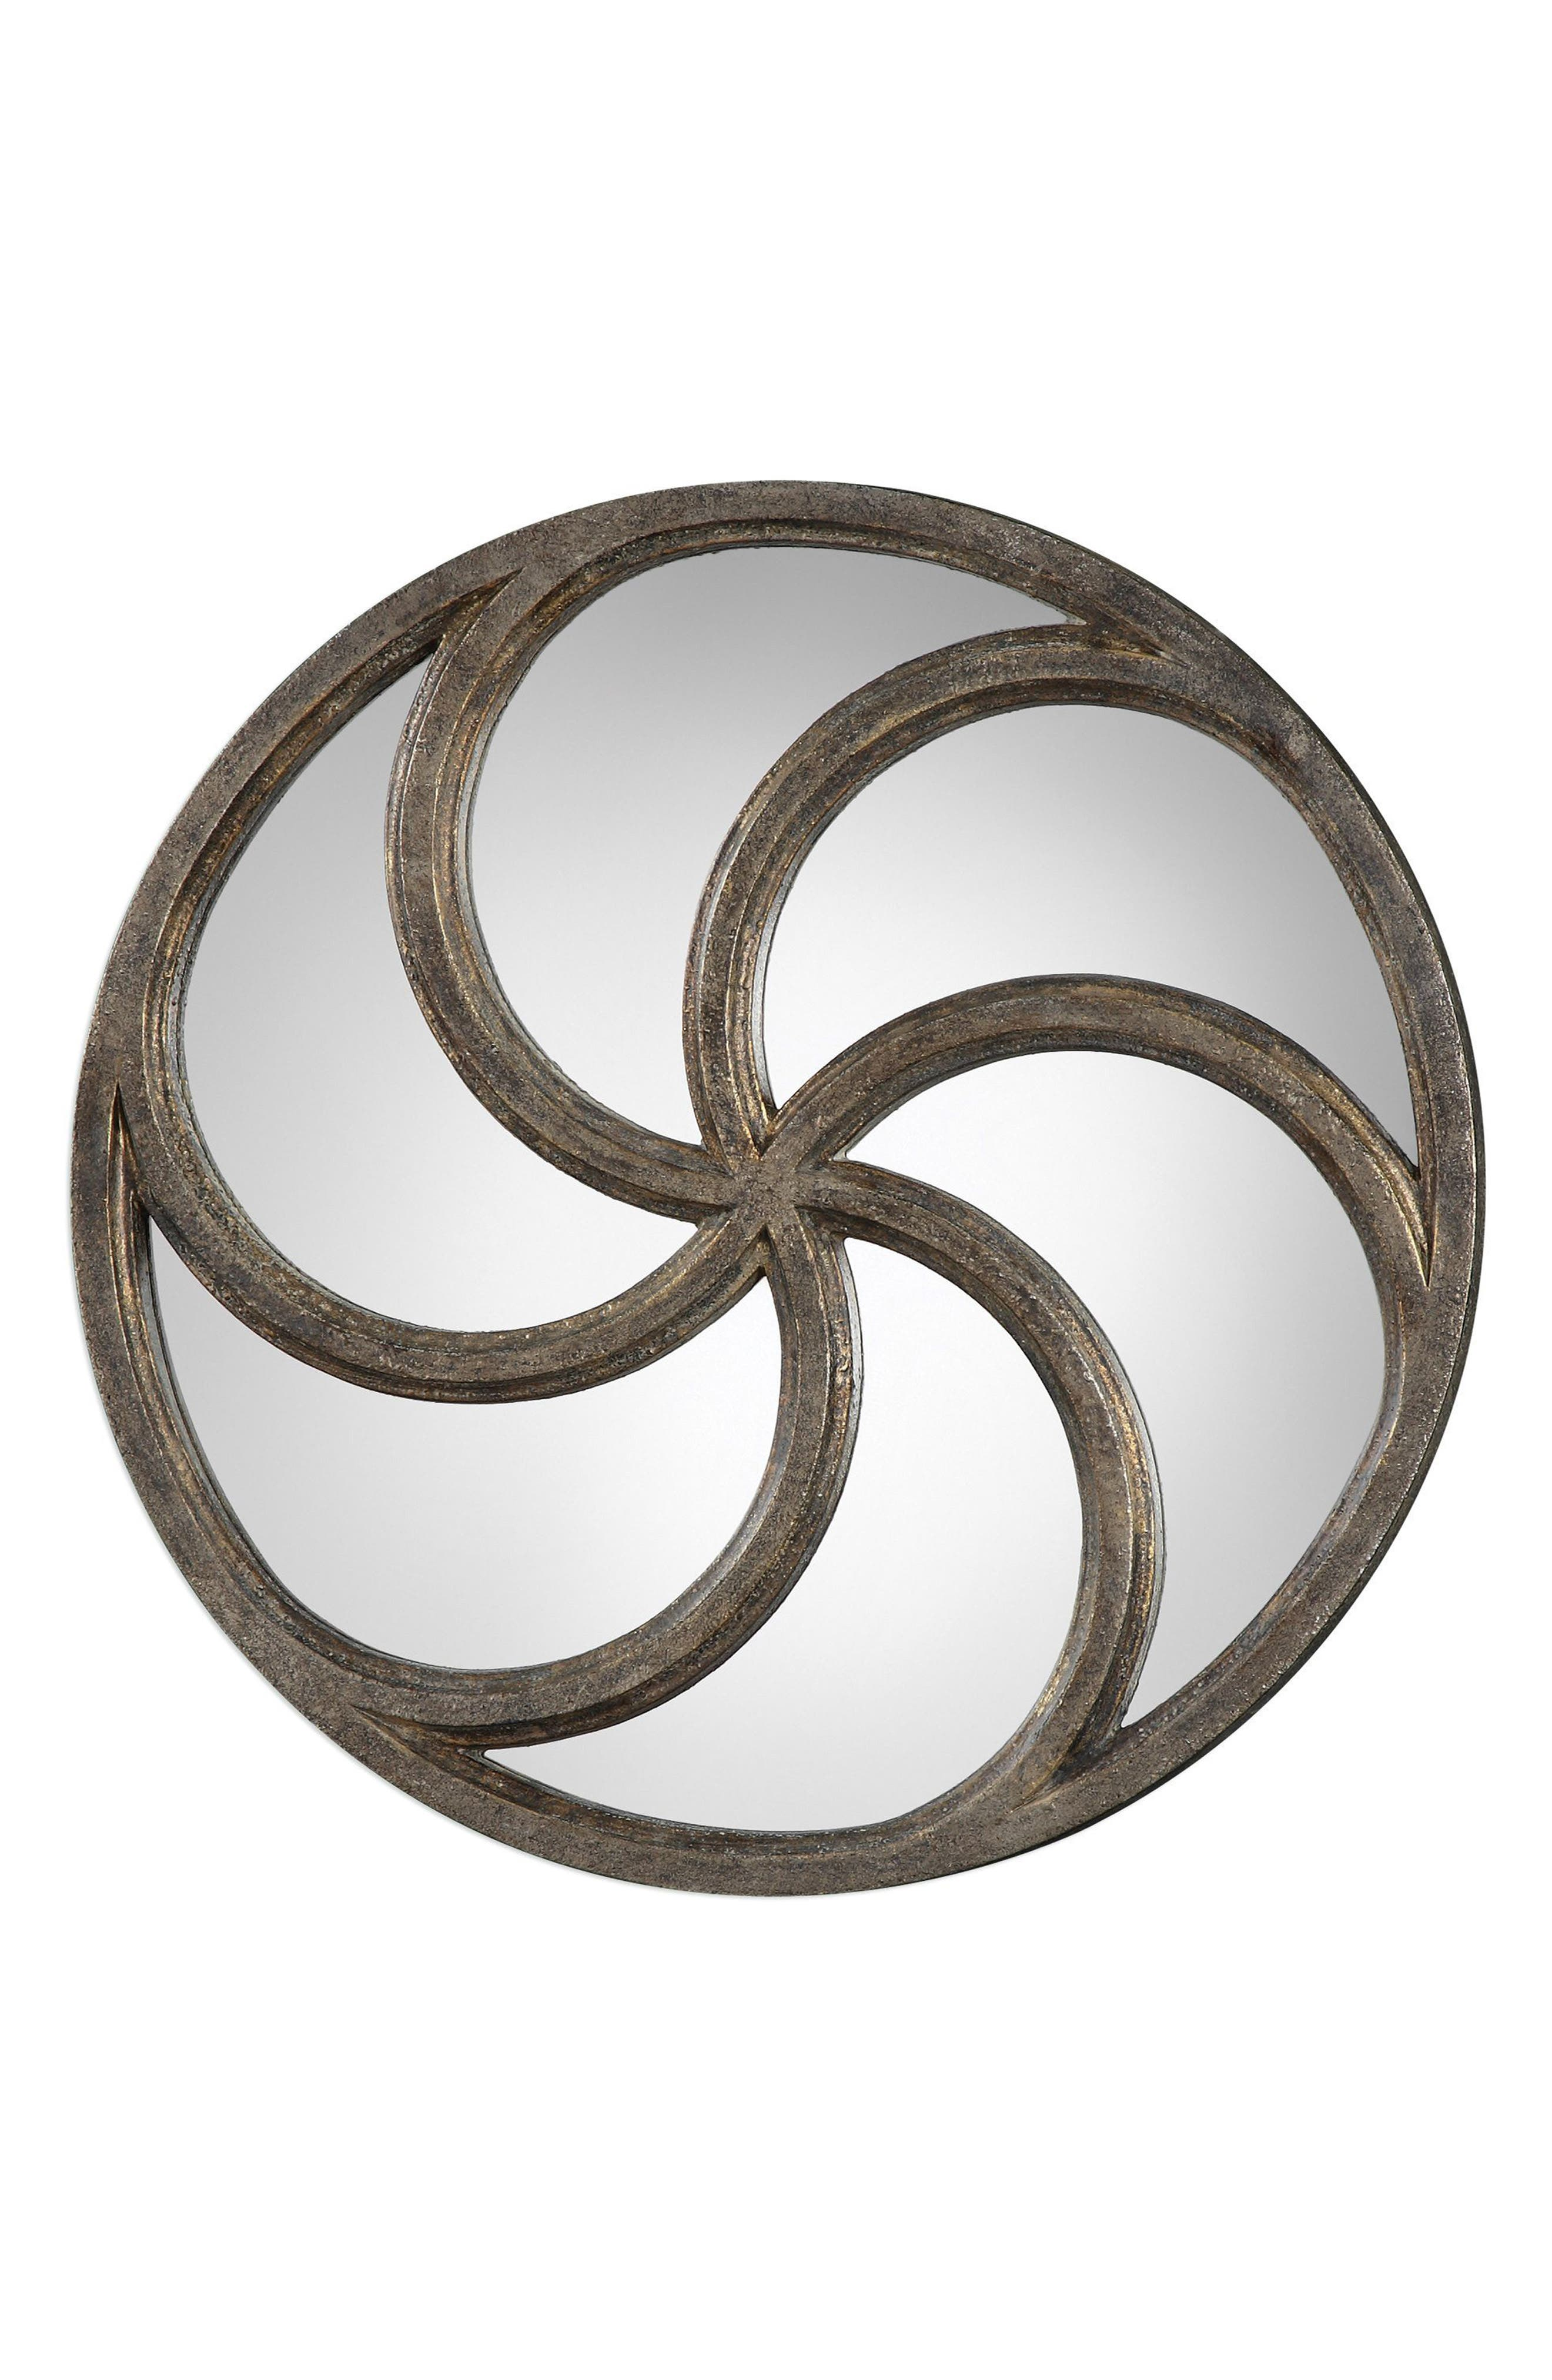 Main Image - Uttermost Spiralis Wall Mirror